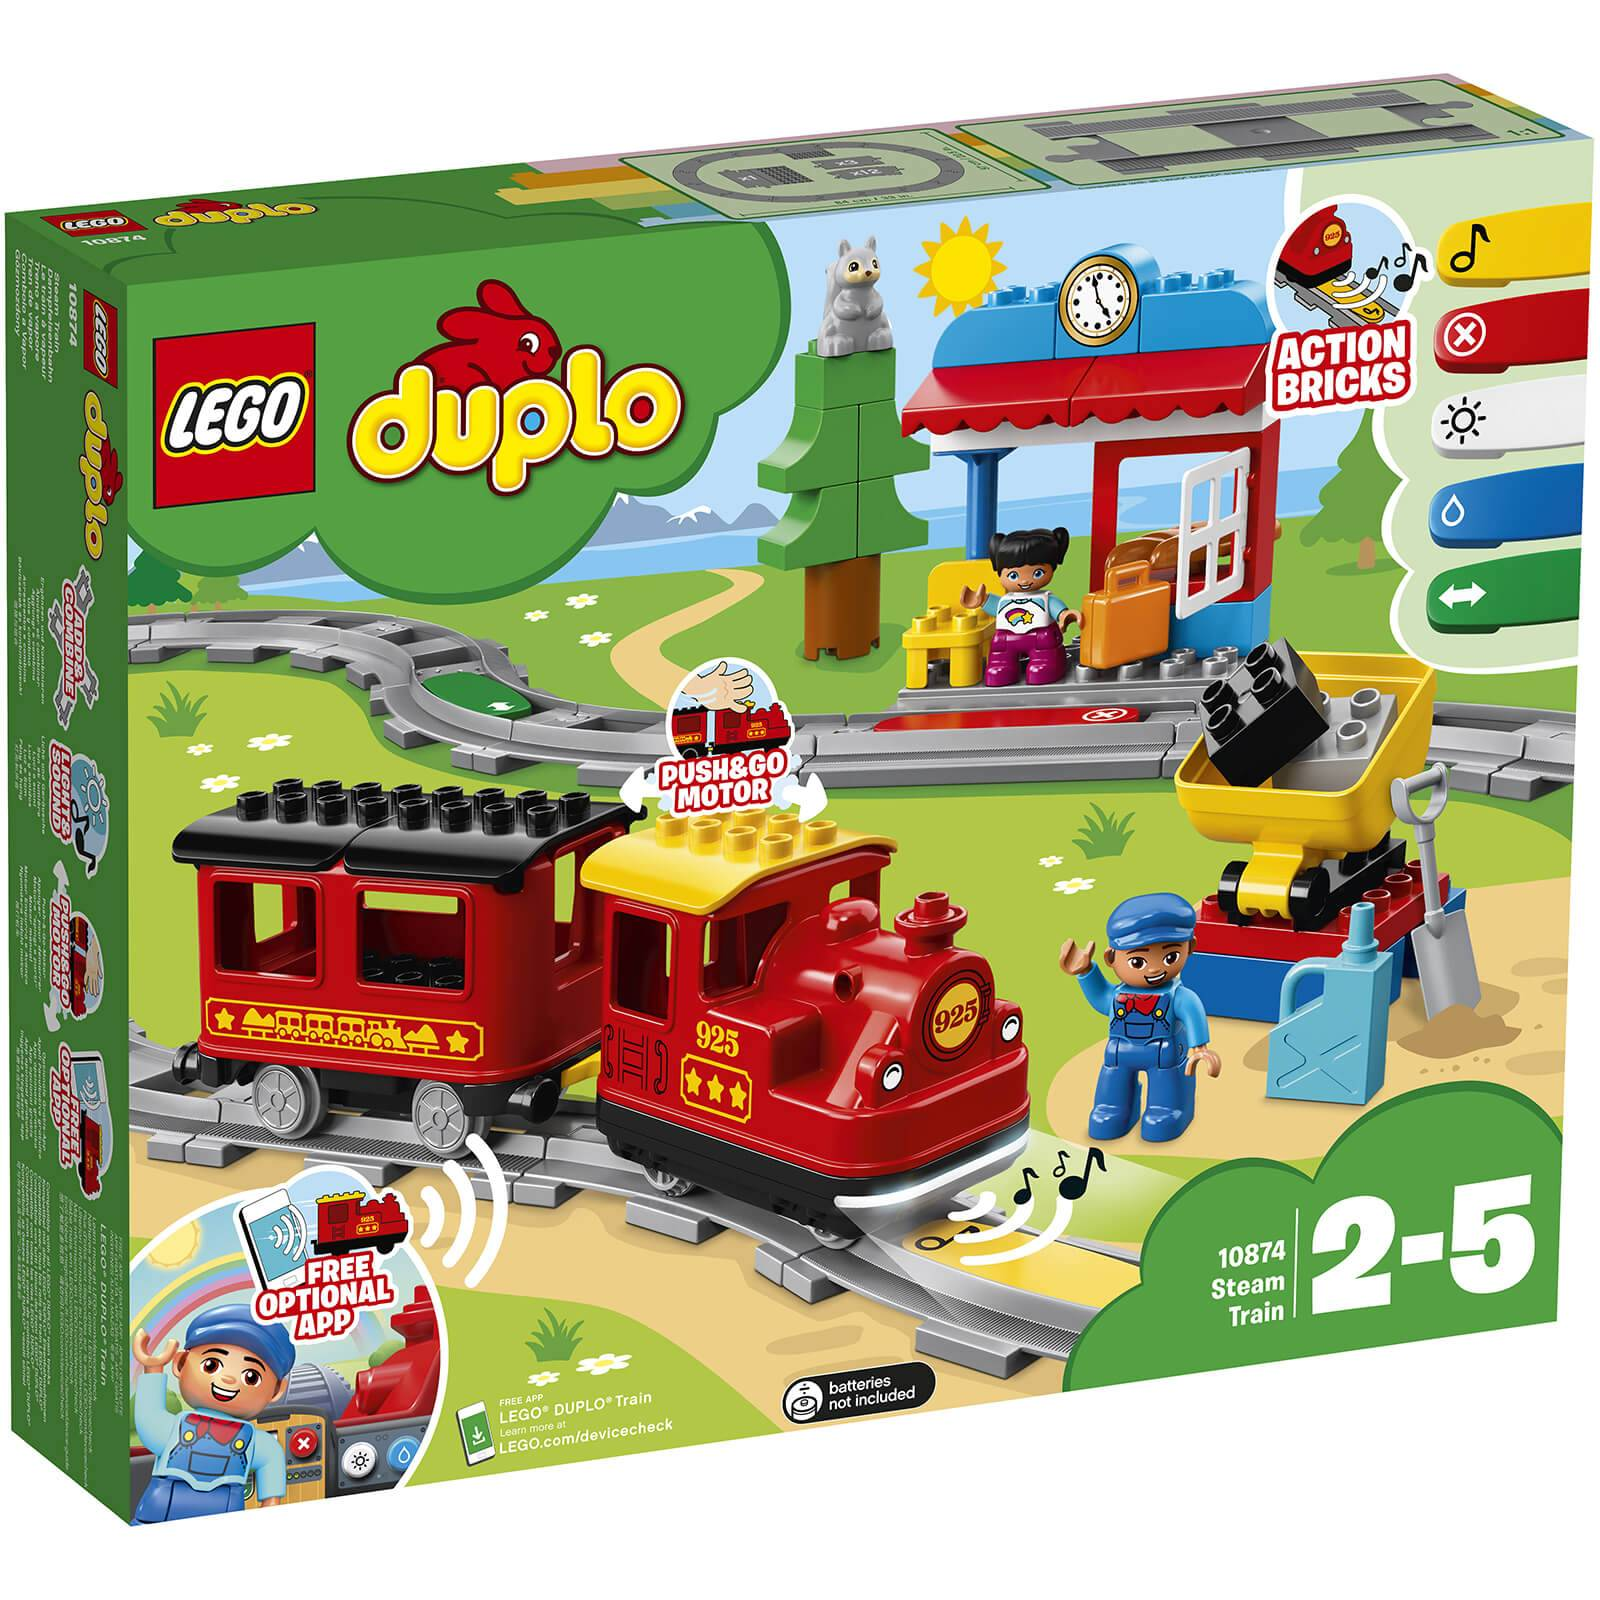 Lego DUPLO Town: Steam Train (10874)